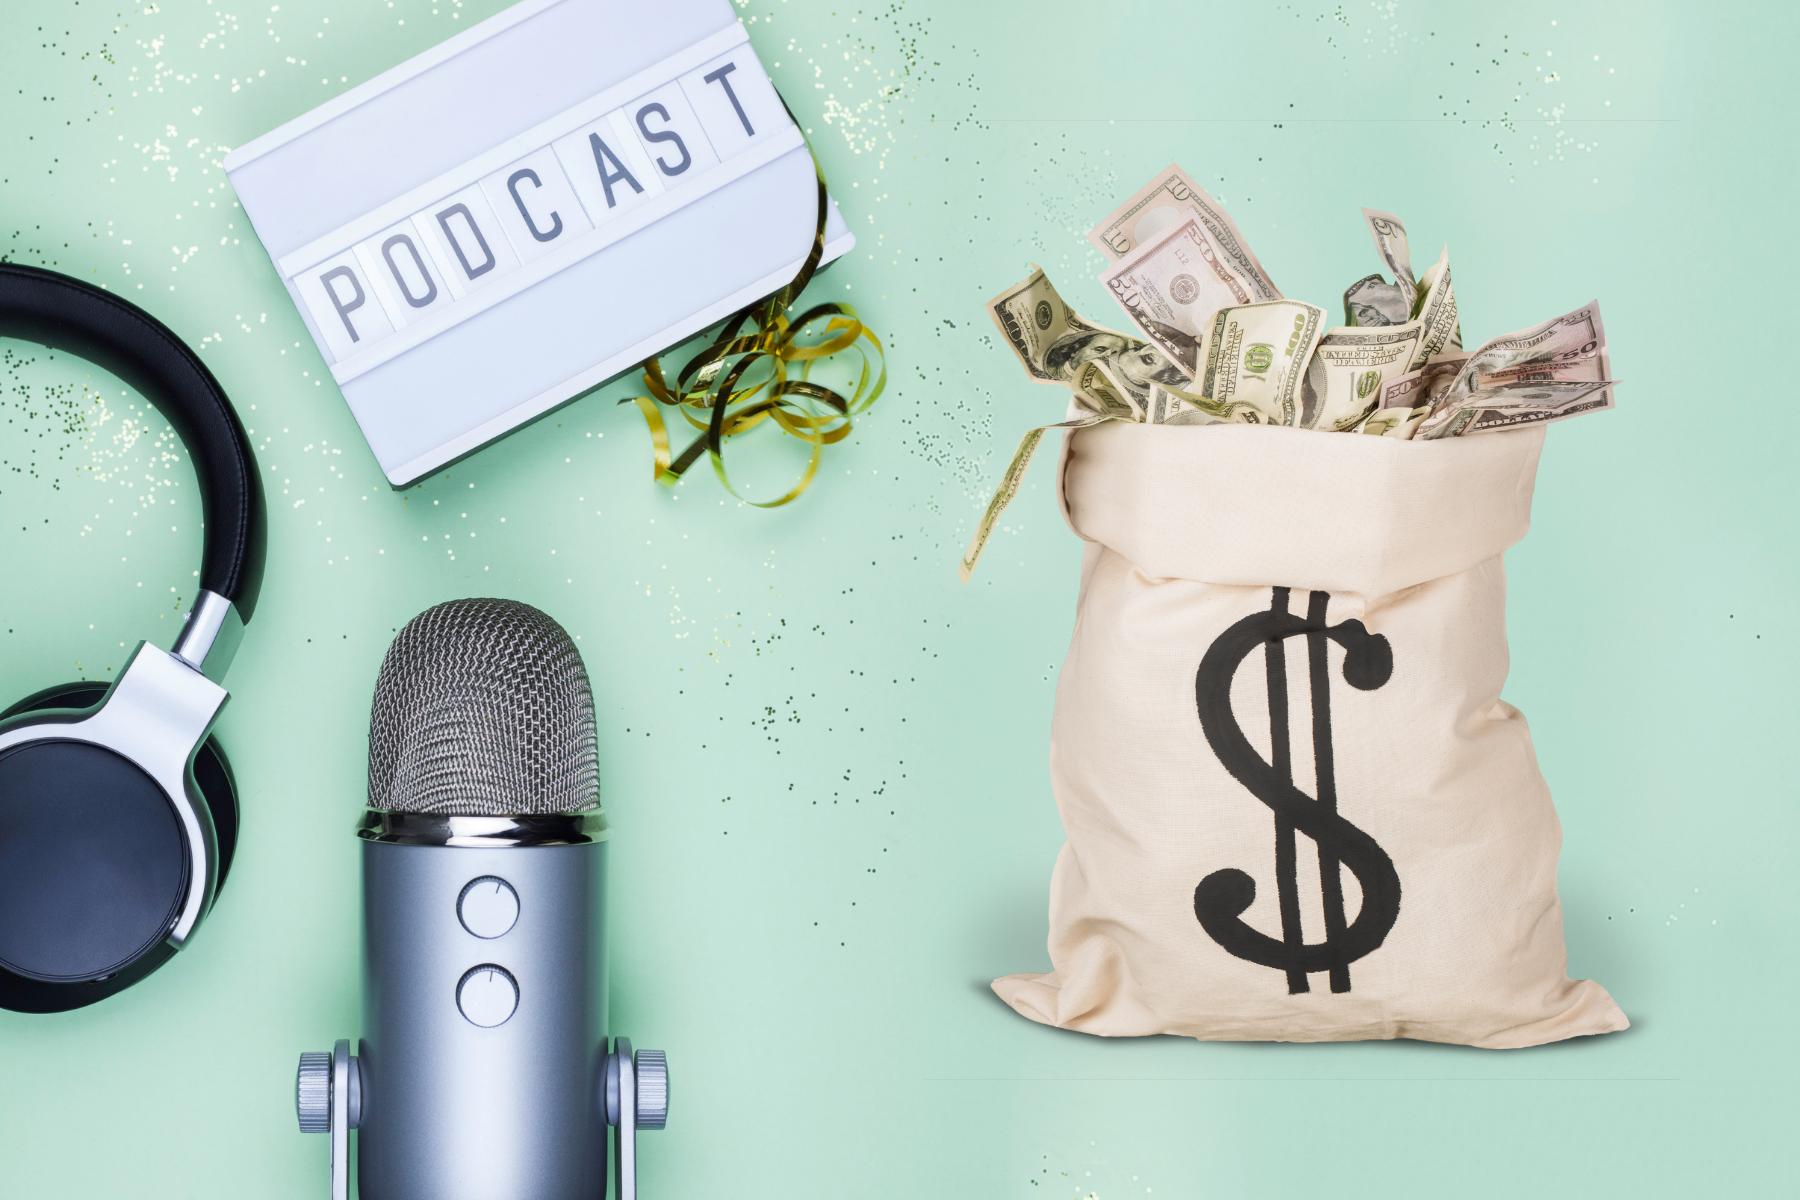 How Do Podcasters Make Money?